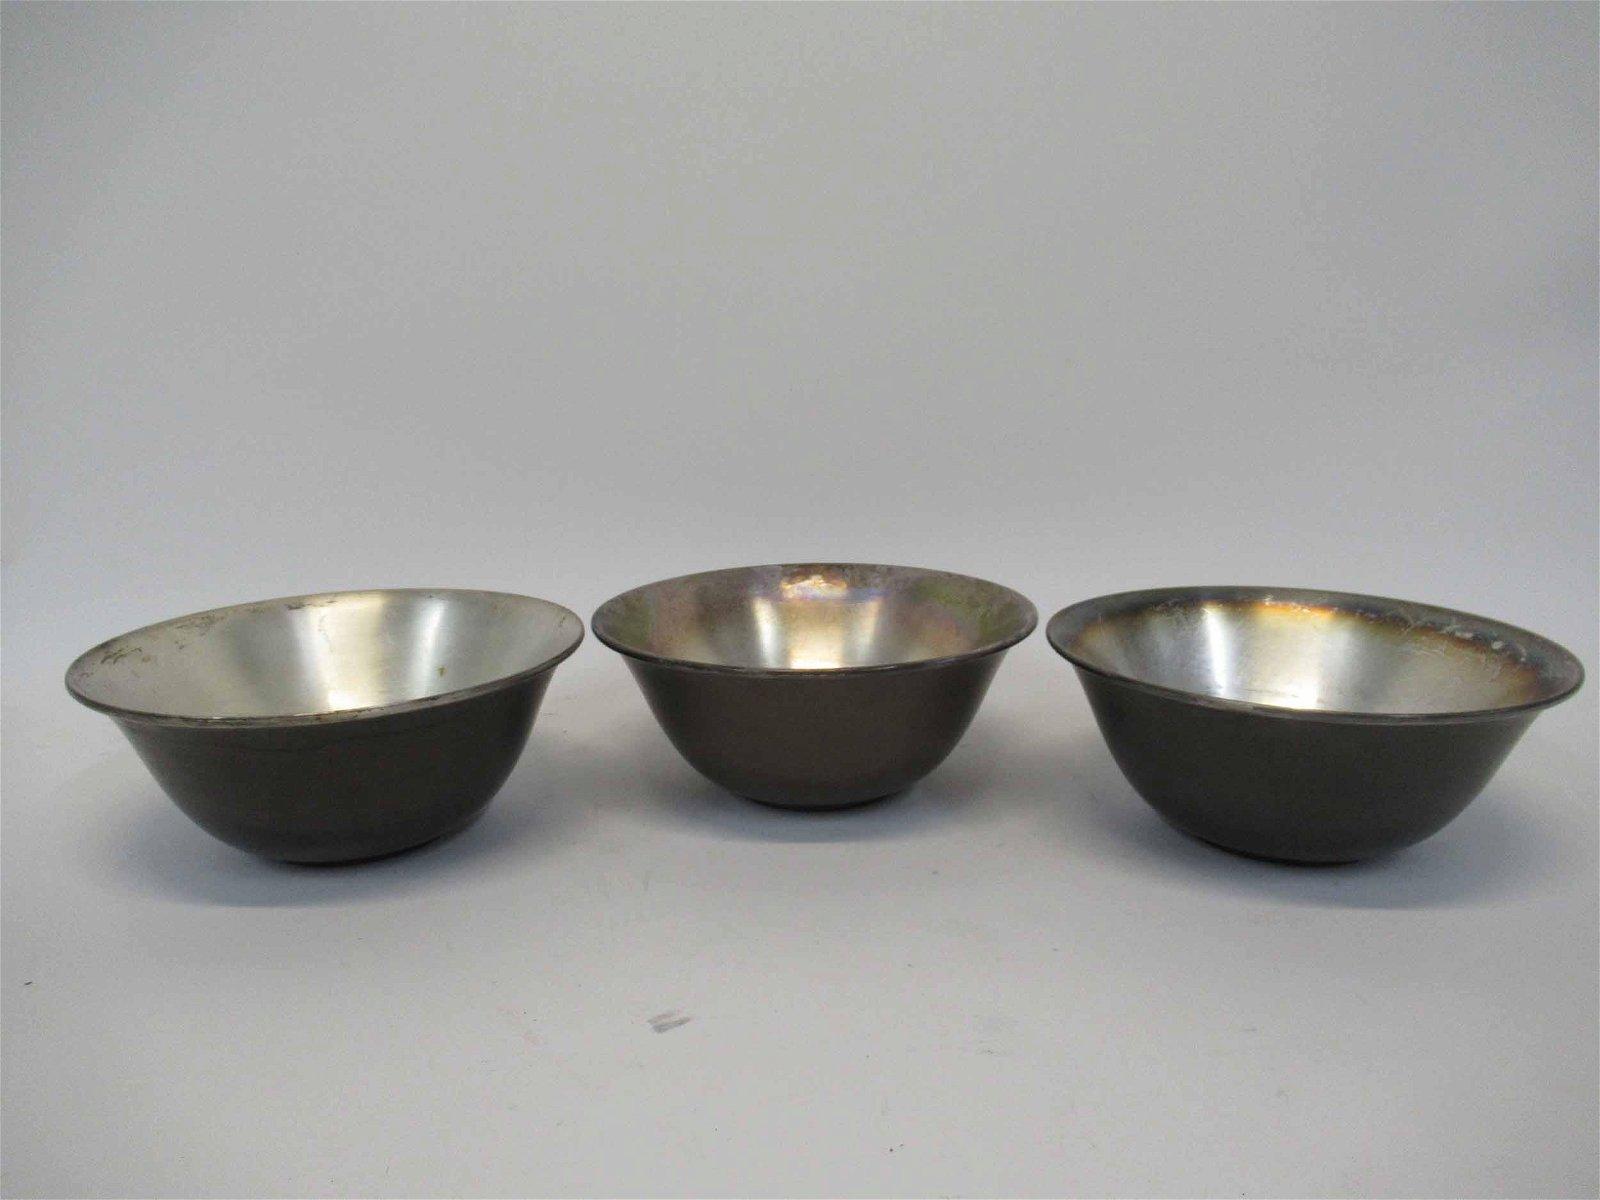 Set of Three William Lipton Metalware Bowls